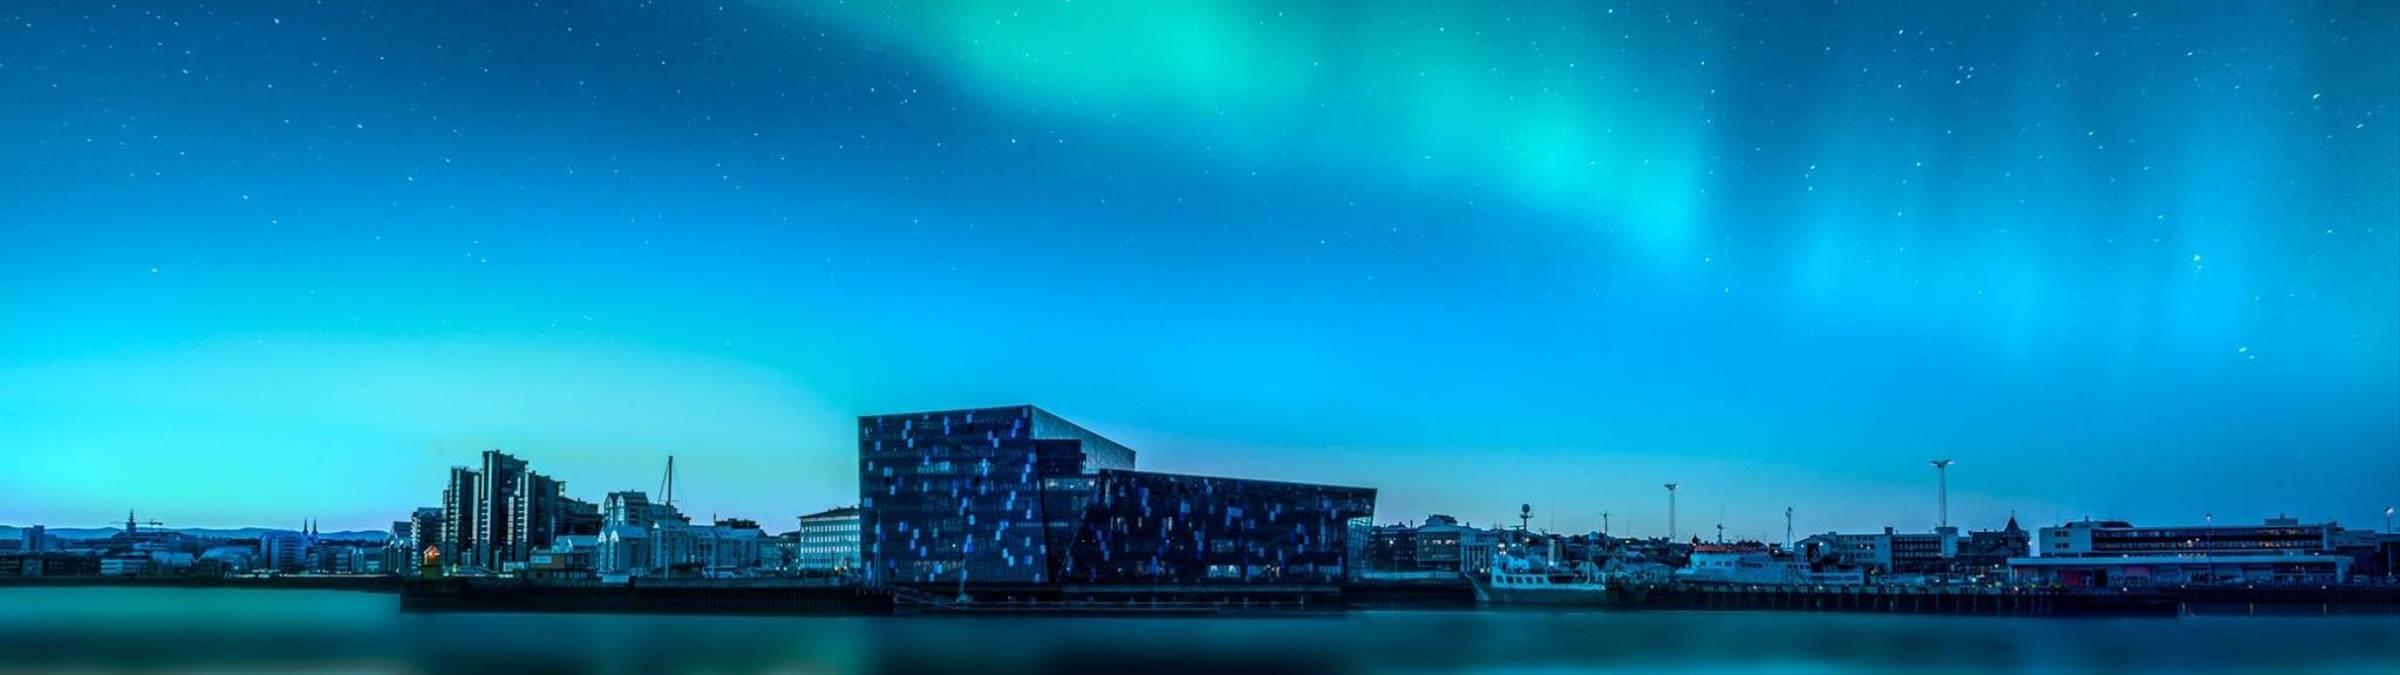 Reykjavik_evening (1).jpg